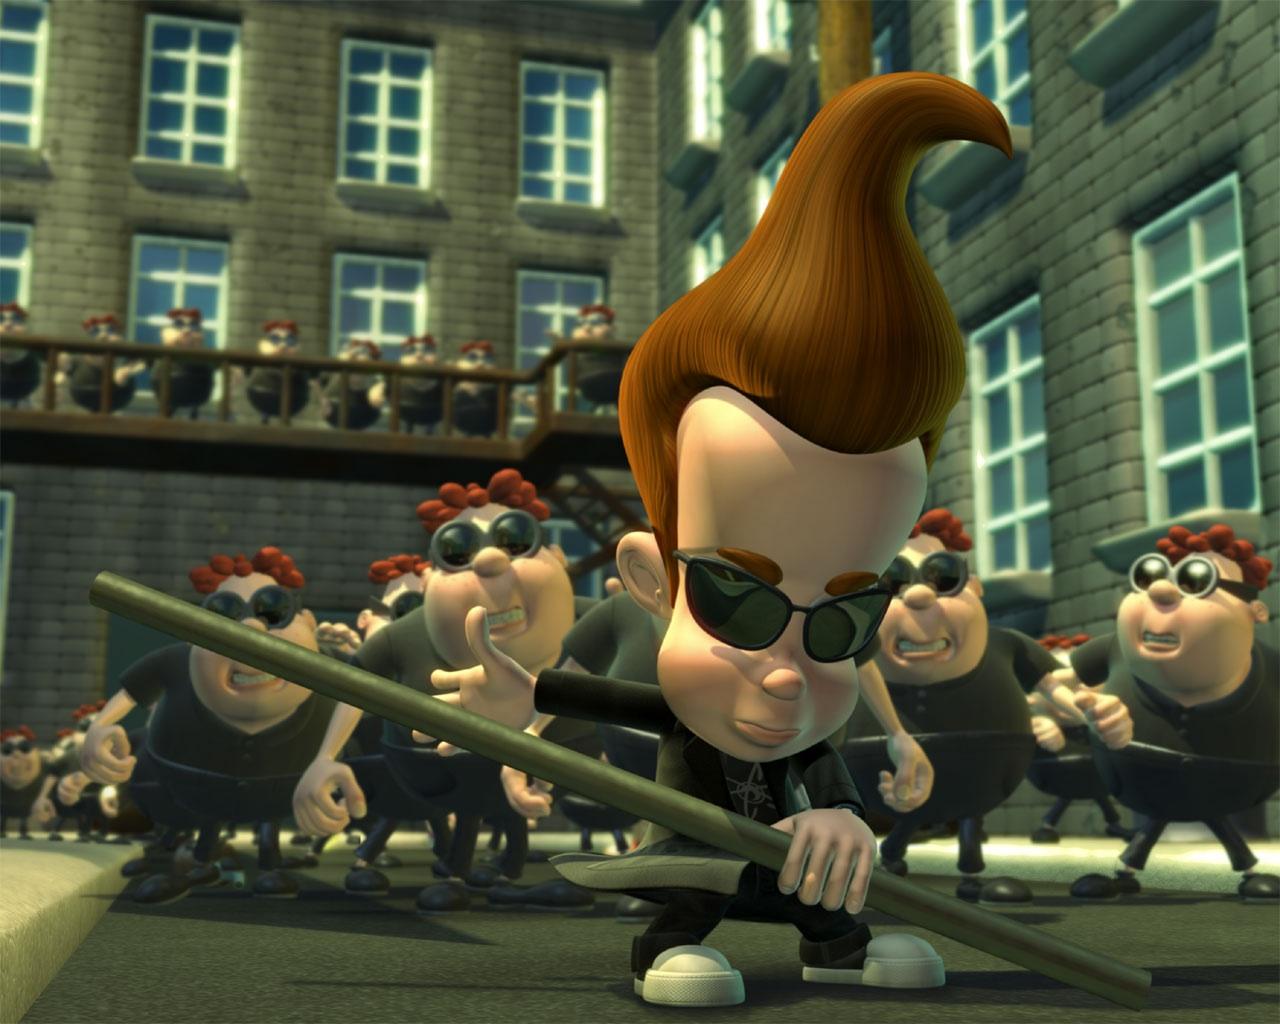 Nickelodeon kids games celebrity astias